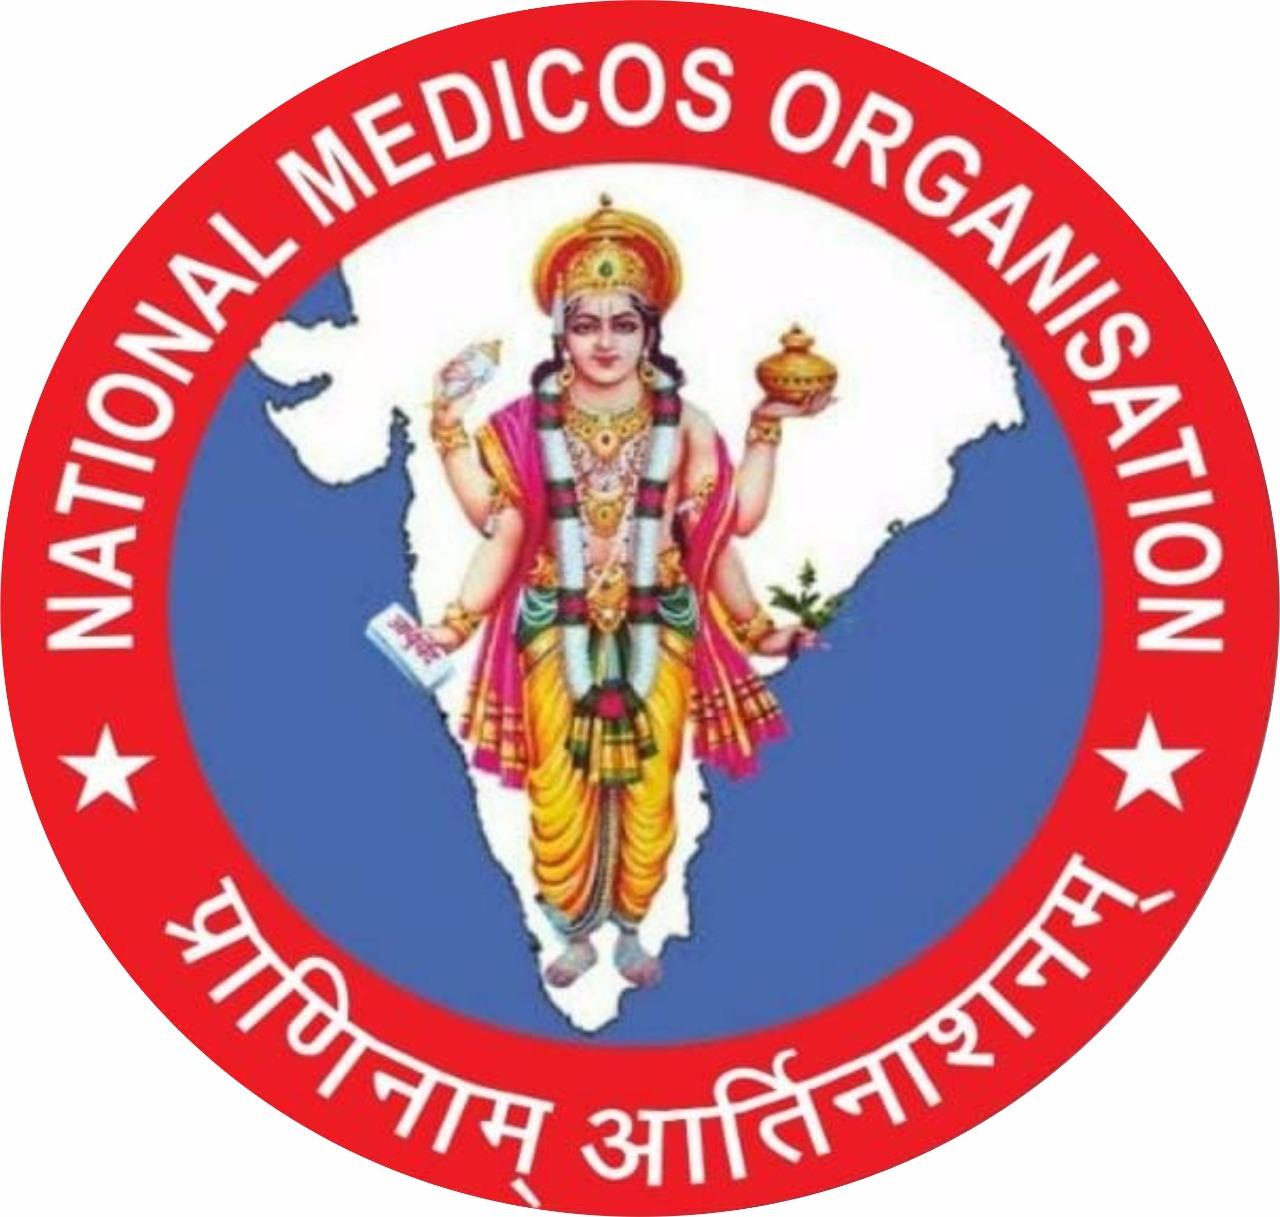 NMO India